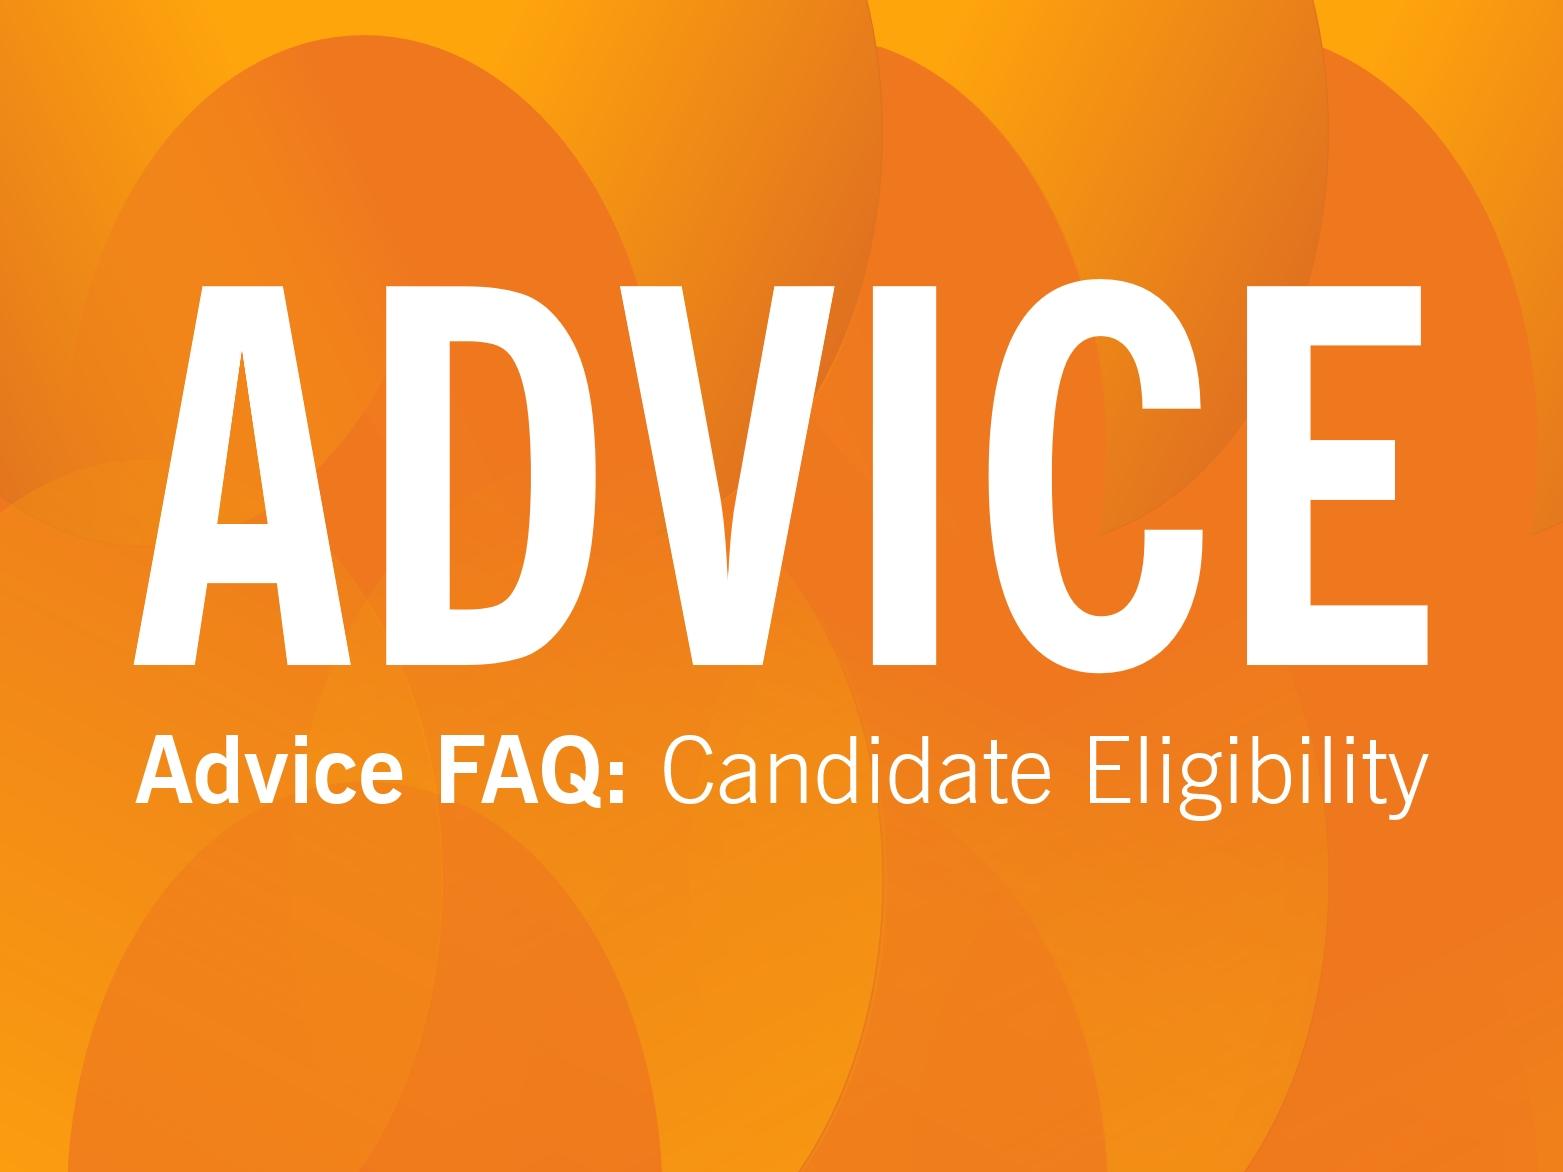 ADVICE: Candidate eligibility